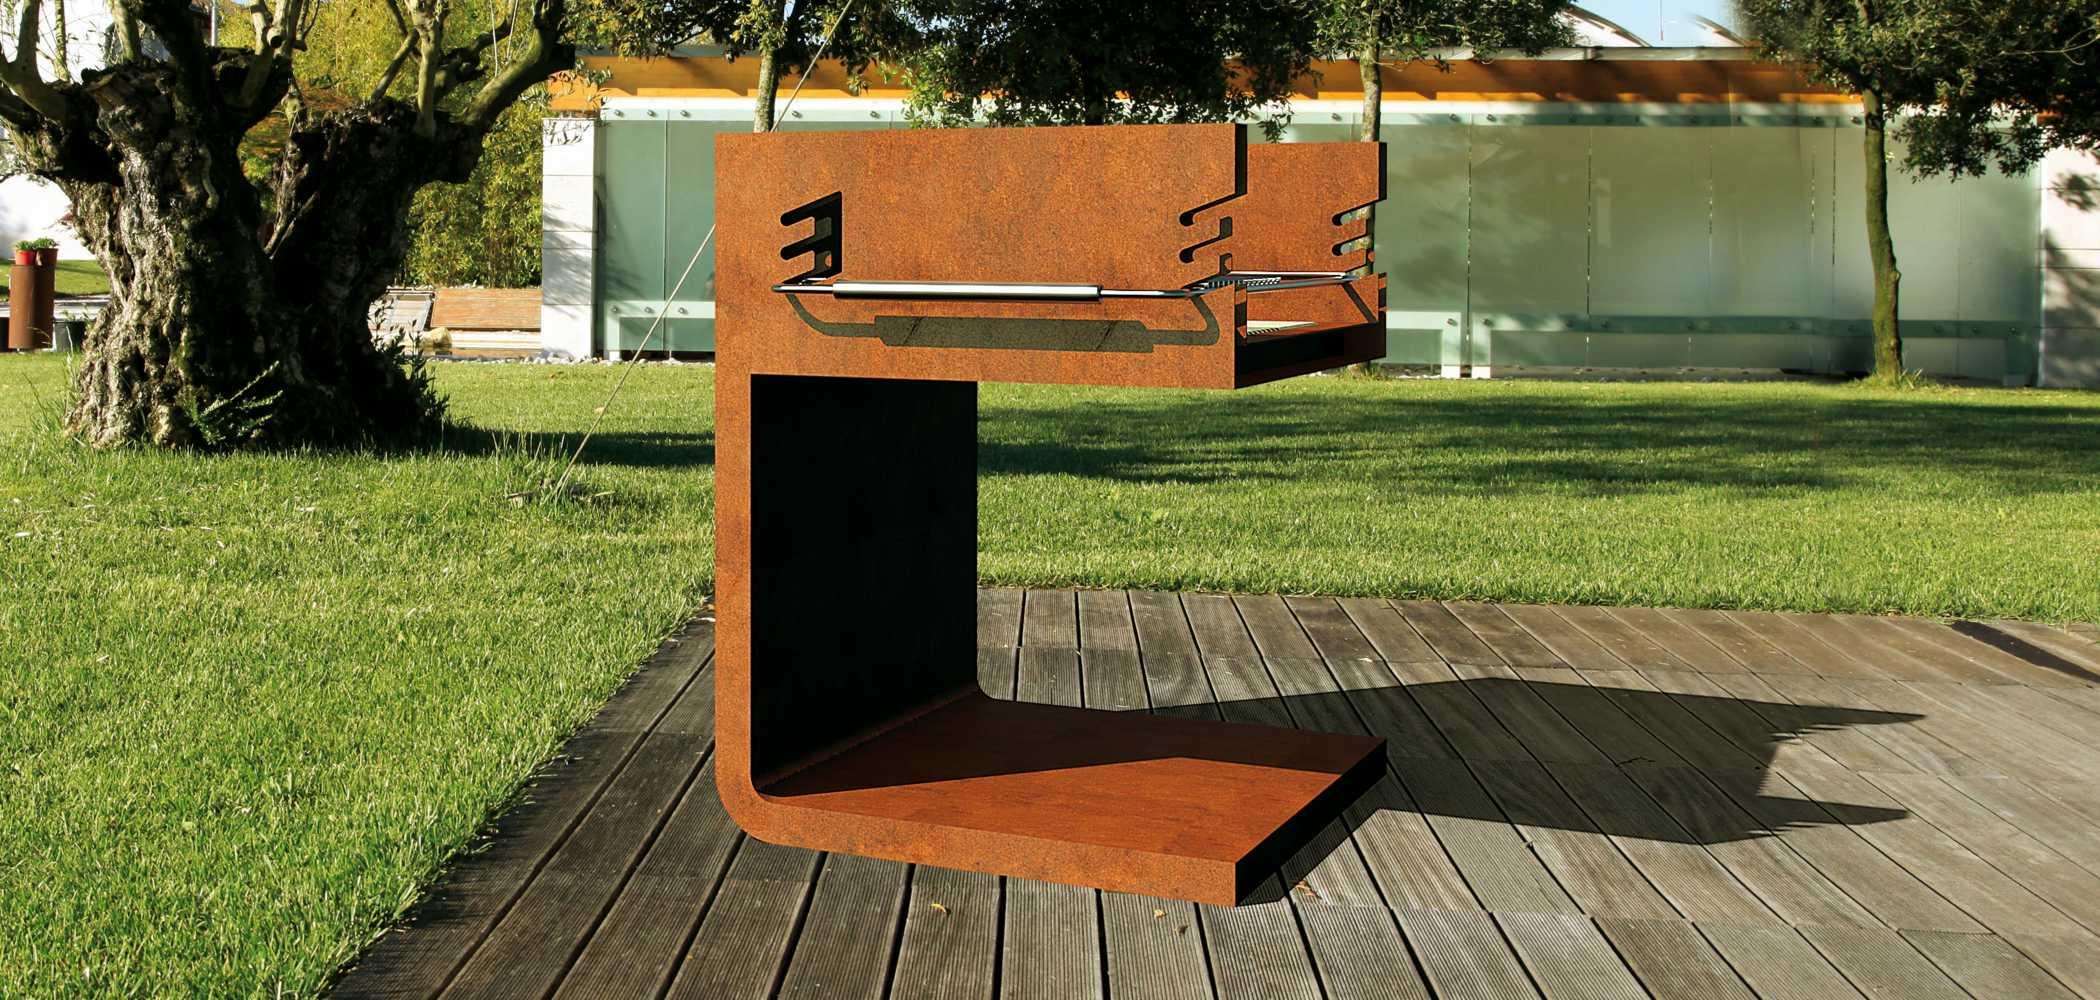 c bq barbecue metalco. Black Bedroom Furniture Sets. Home Design Ideas